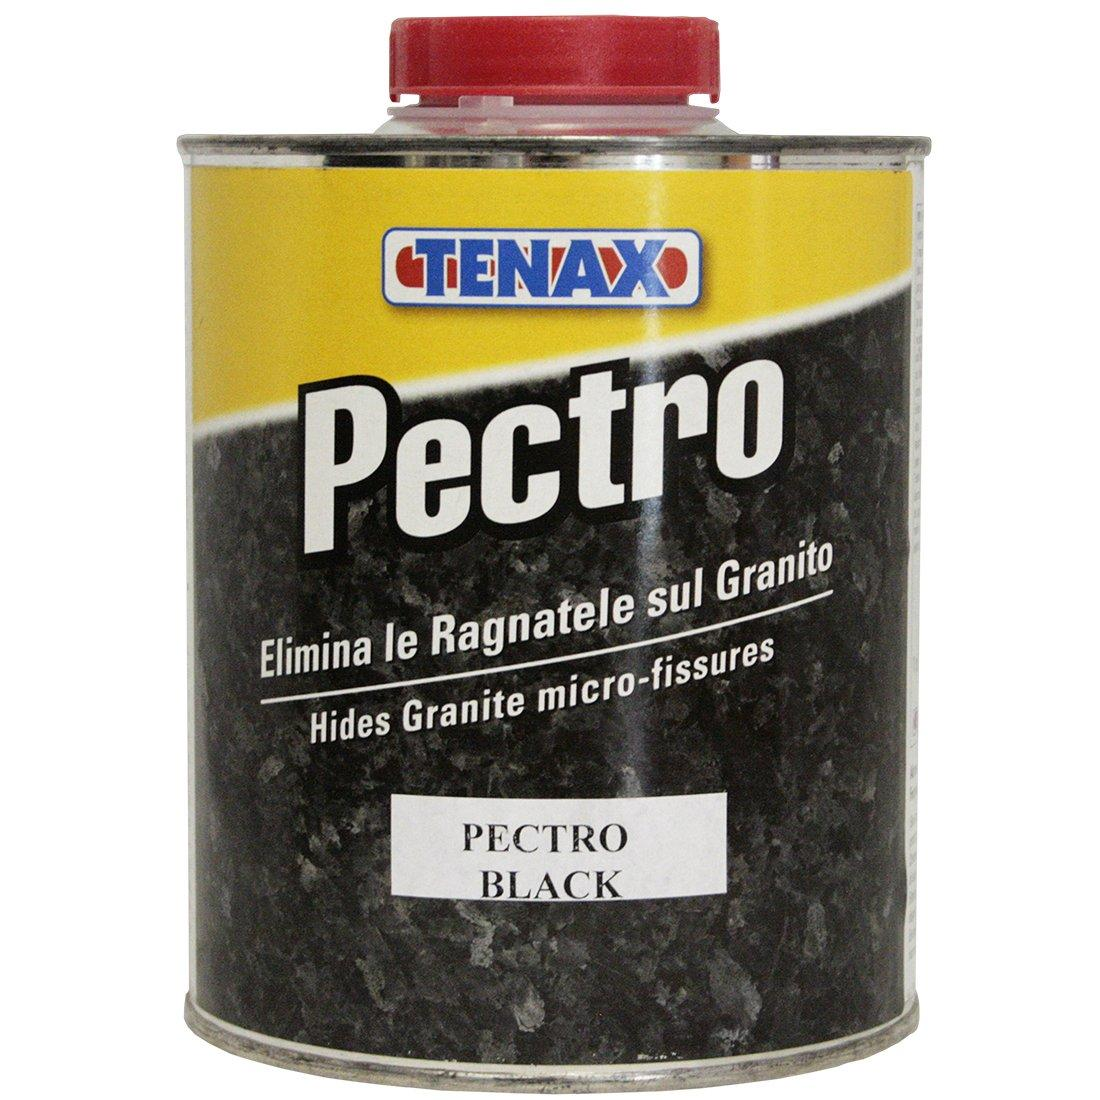 Защитная пропитка для натурального камня, мрамора, гранита PECTRO (1л) TENAX